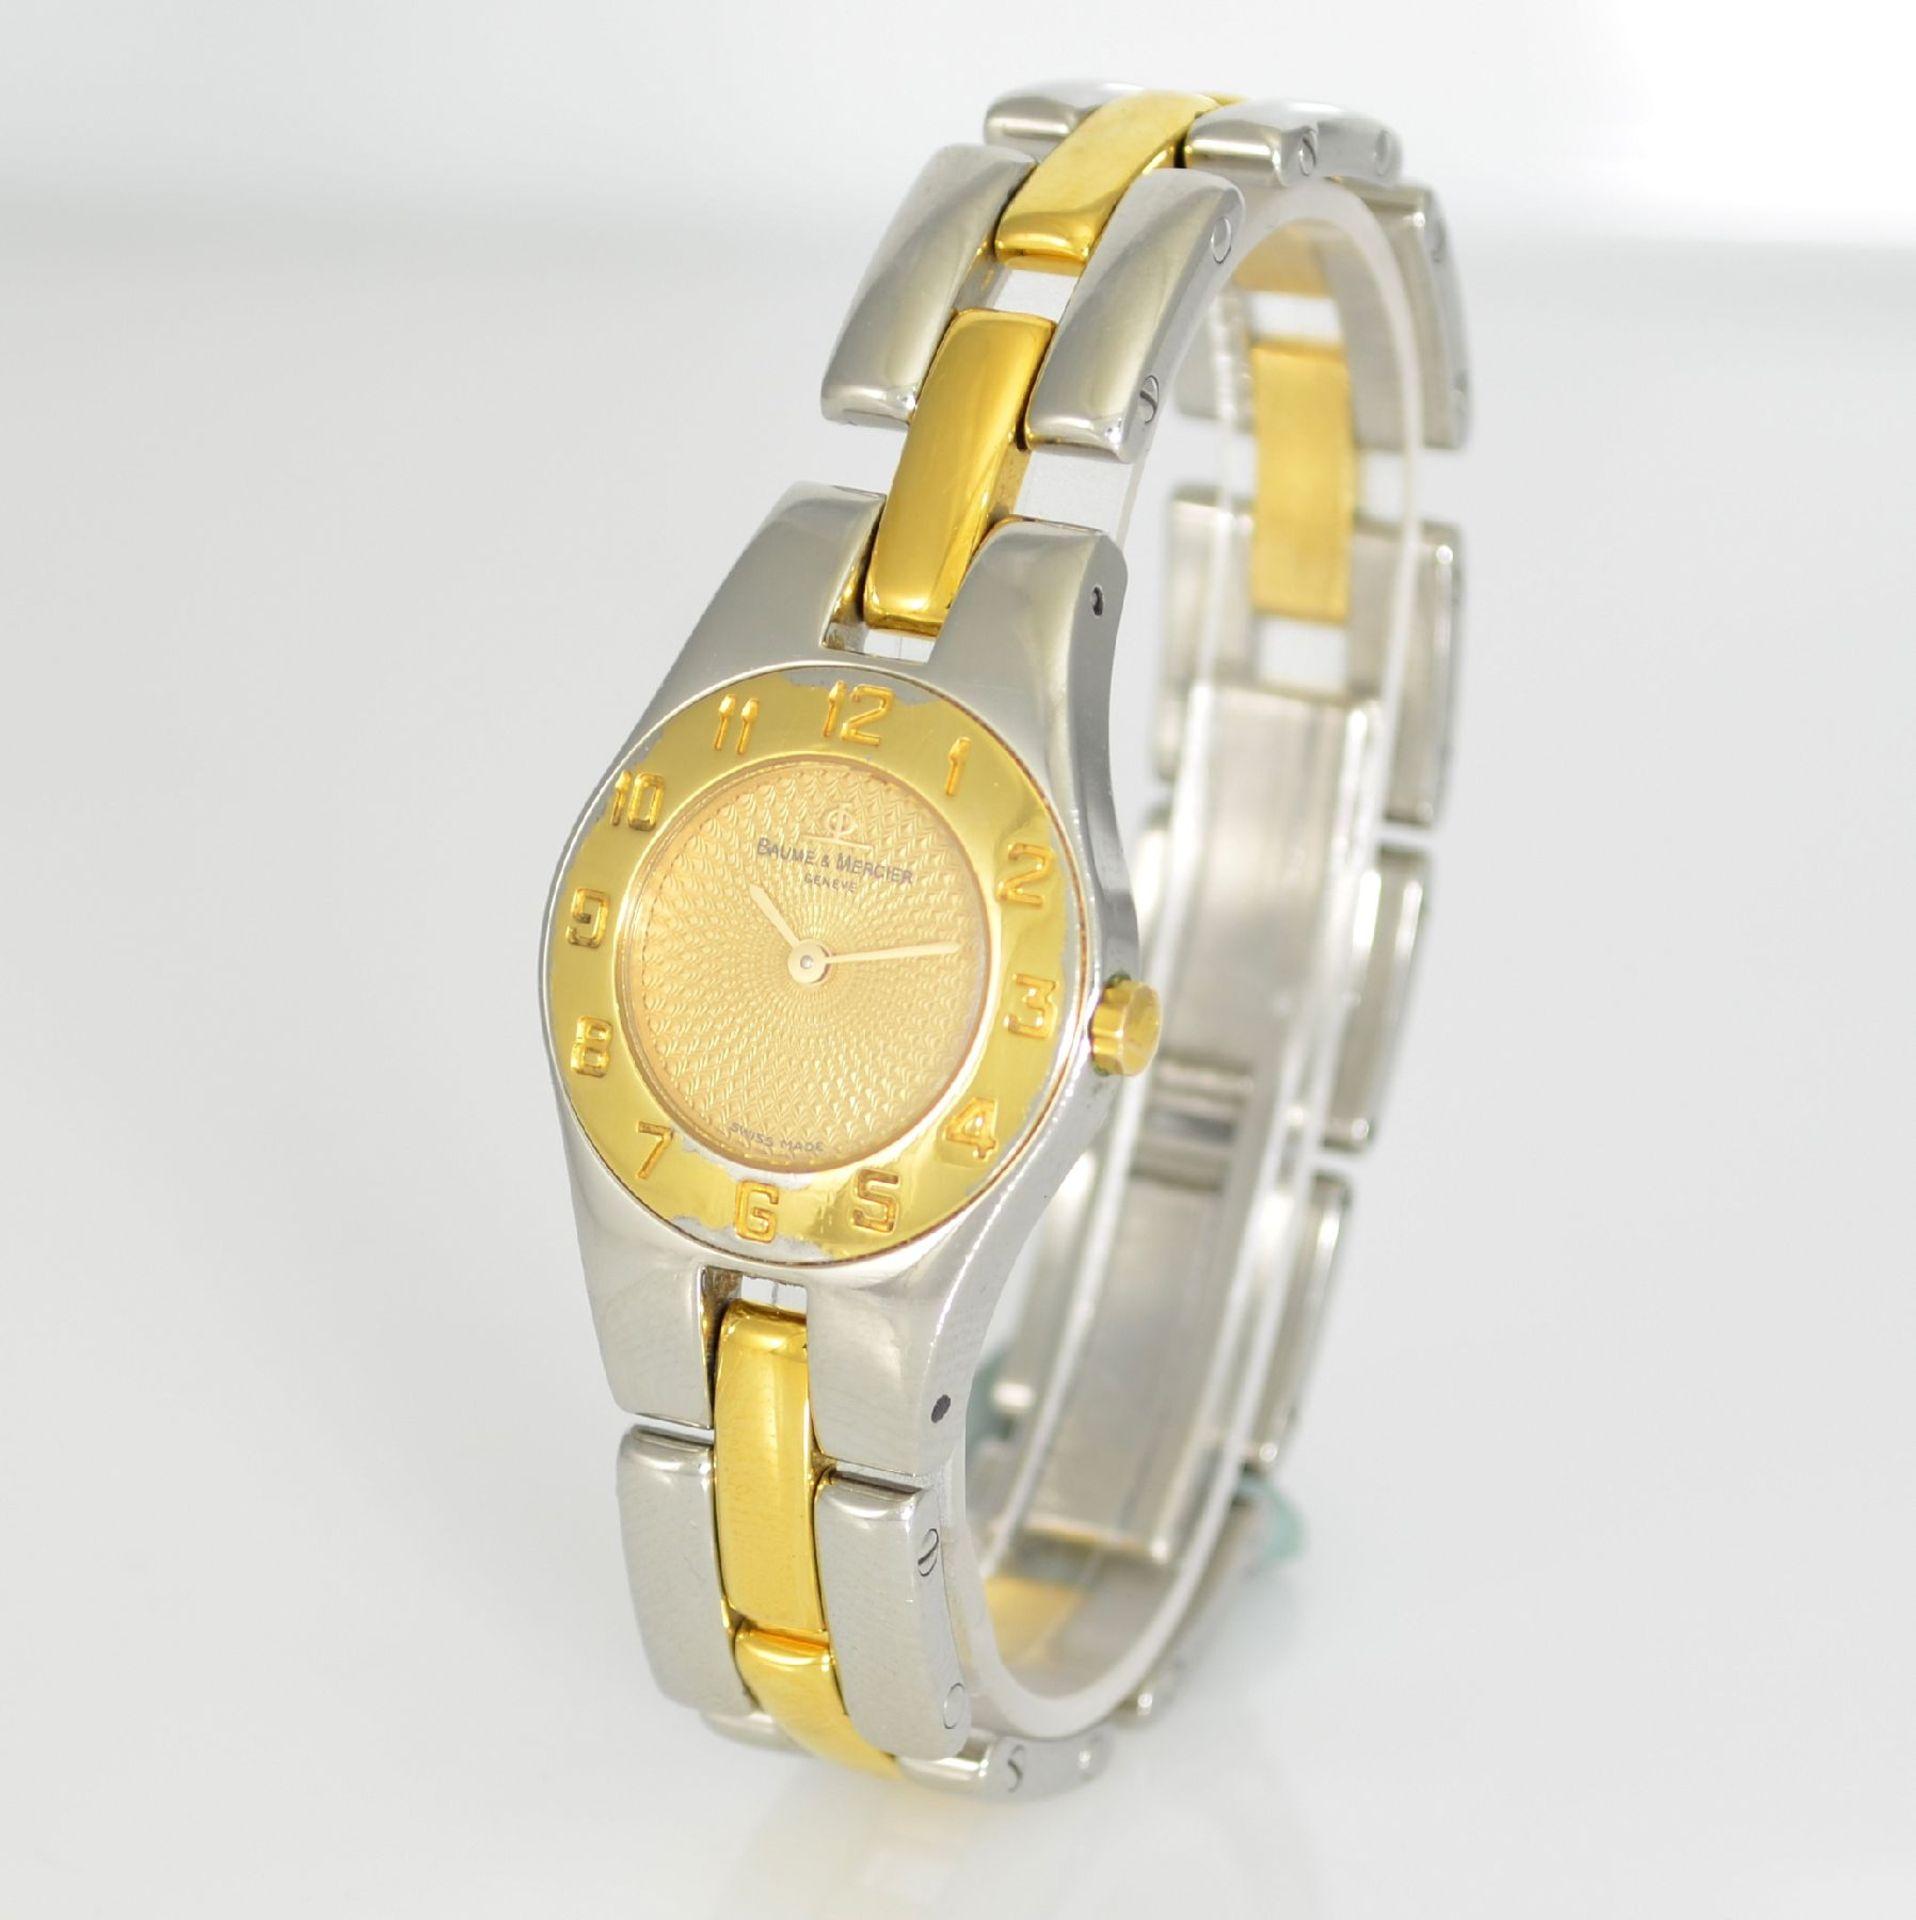 BAUME & MERCIER Damenarmbanduhr in Stahl/ vergoldet, Schweiz um 2000, gedr. Geh. m. integr. - Bild 3 aus 6